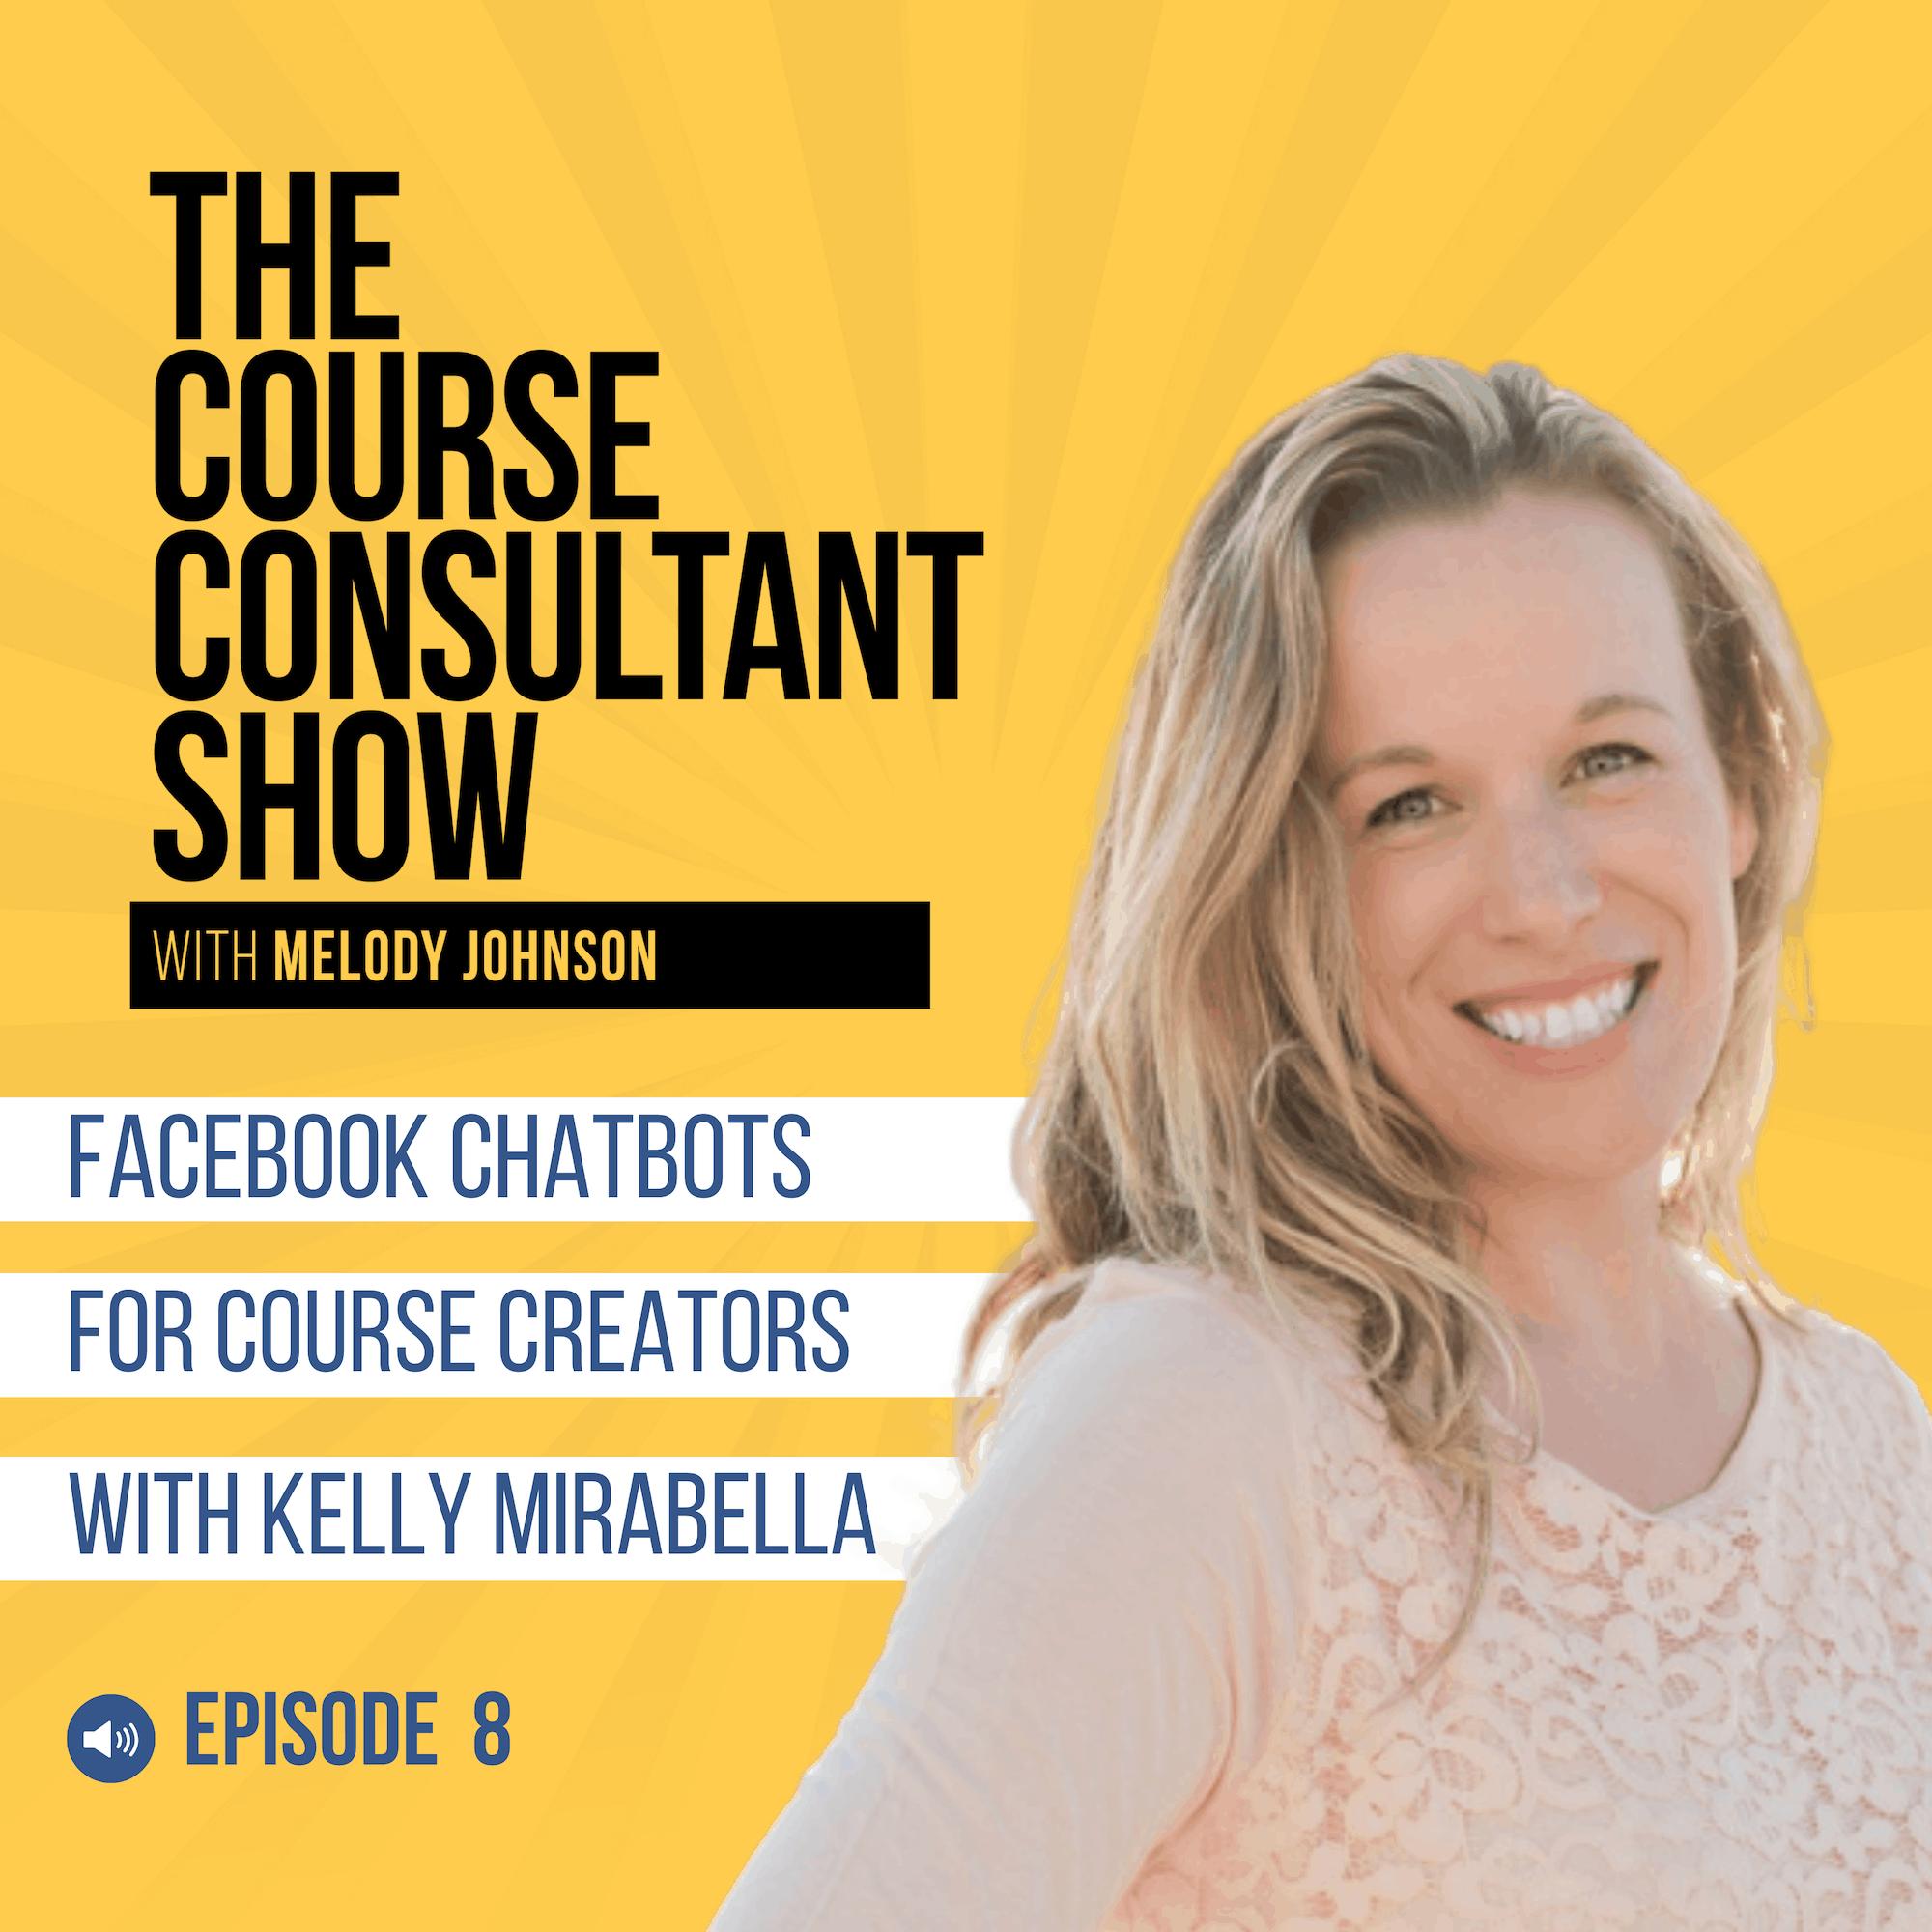 Facebook chatbots for course creators